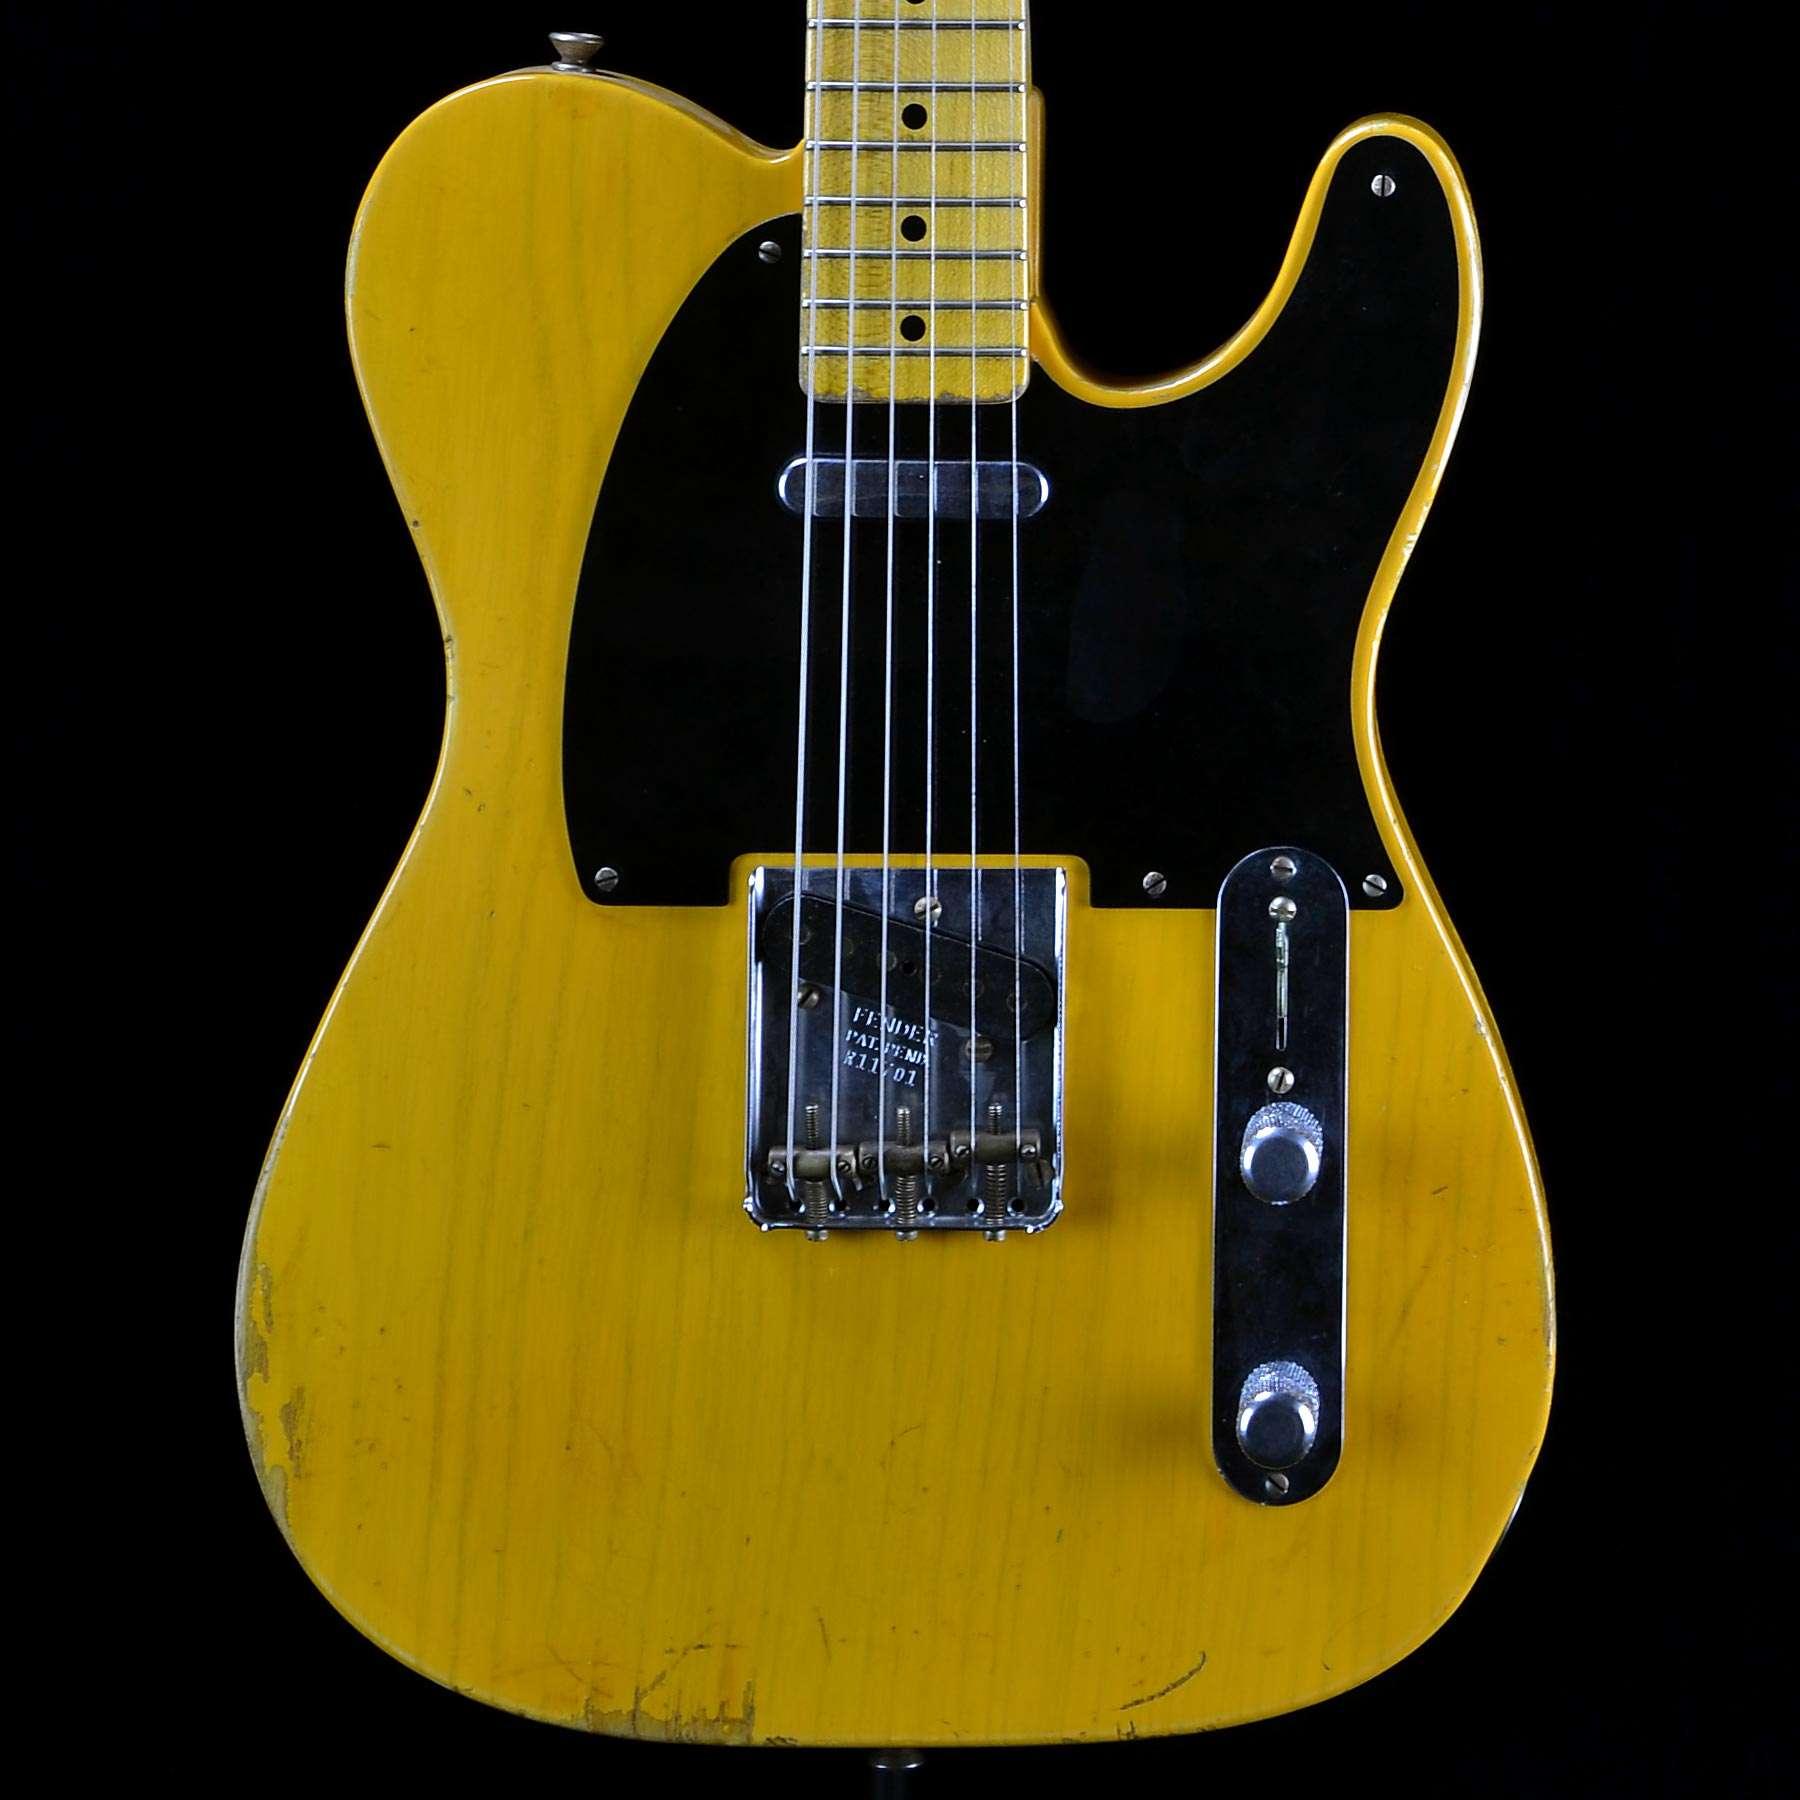 fender 1951 nocaster heavy relic butterscotch blonde wild west guitars. Black Bedroom Furniture Sets. Home Design Ideas